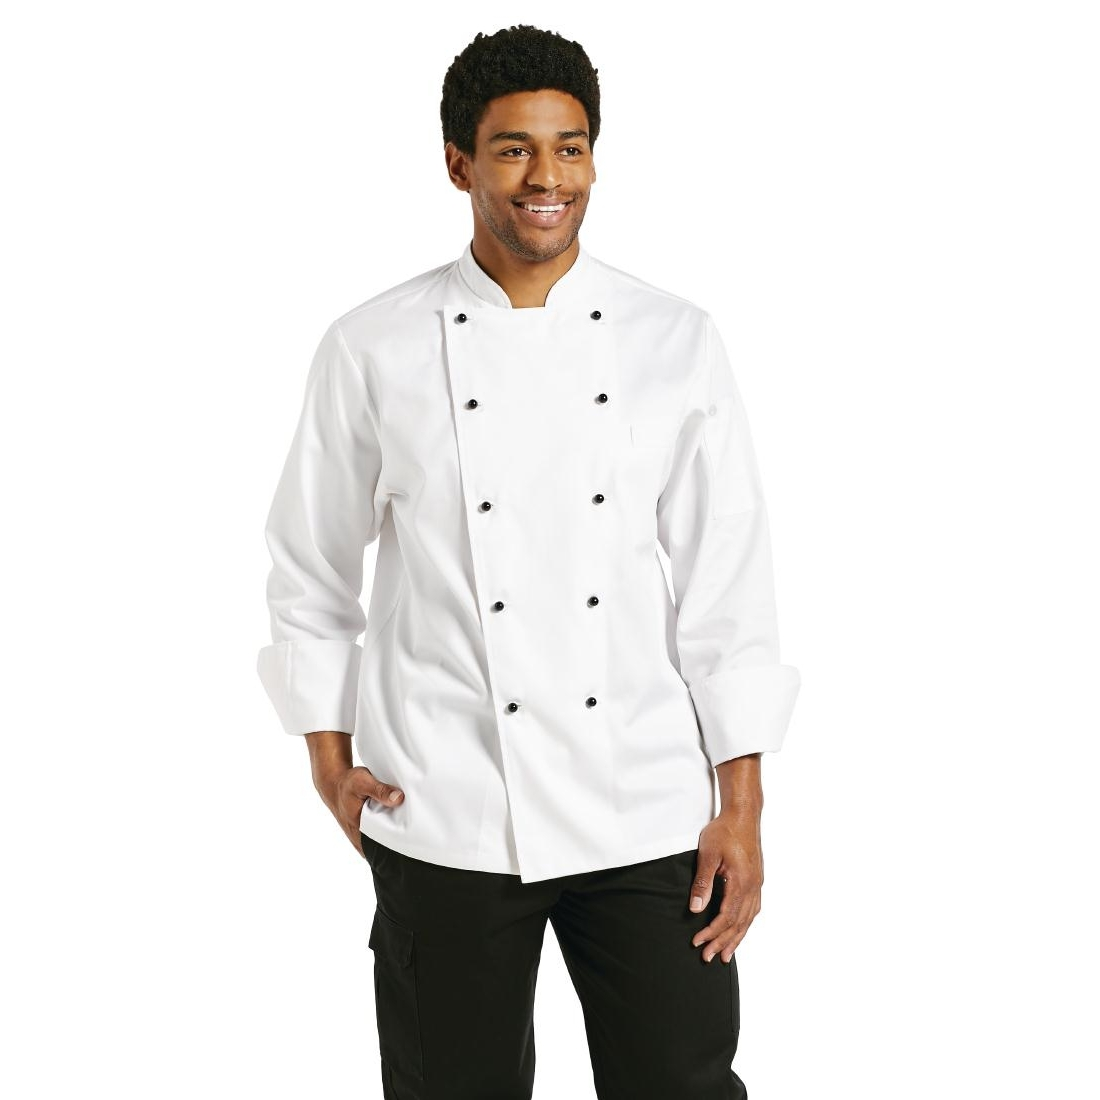 Veste chef unisexe Chef Works Chaumont manches longues